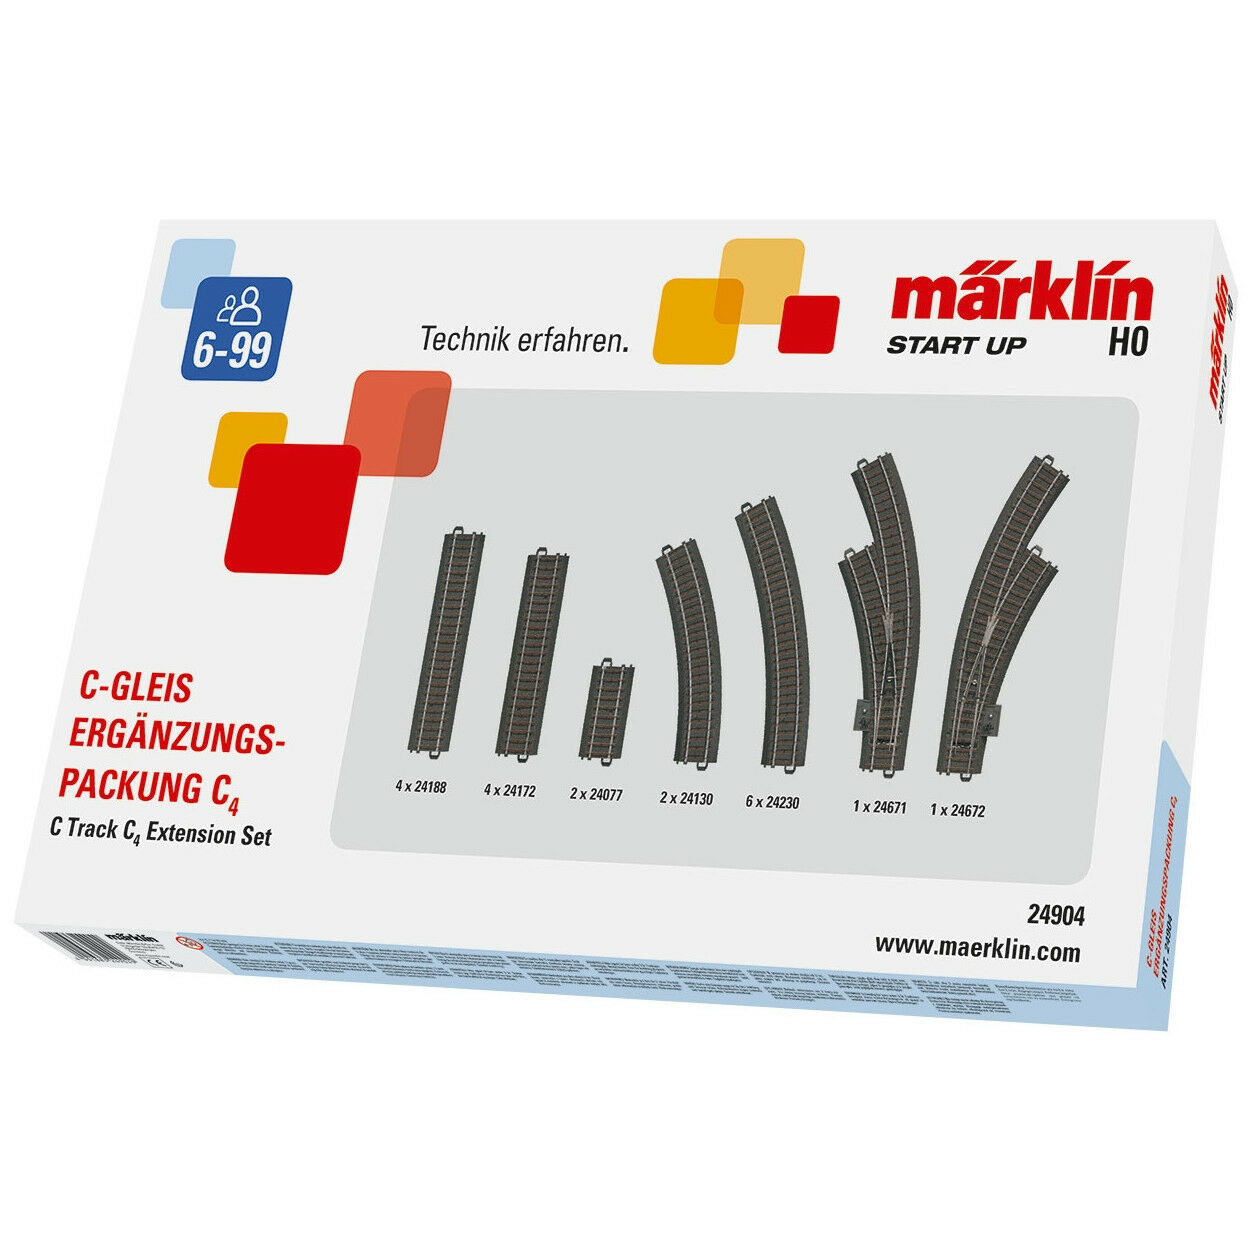 Märklin 24904 C-BINARIO-complemento confezione c4 + + NUOVO & OVP + +